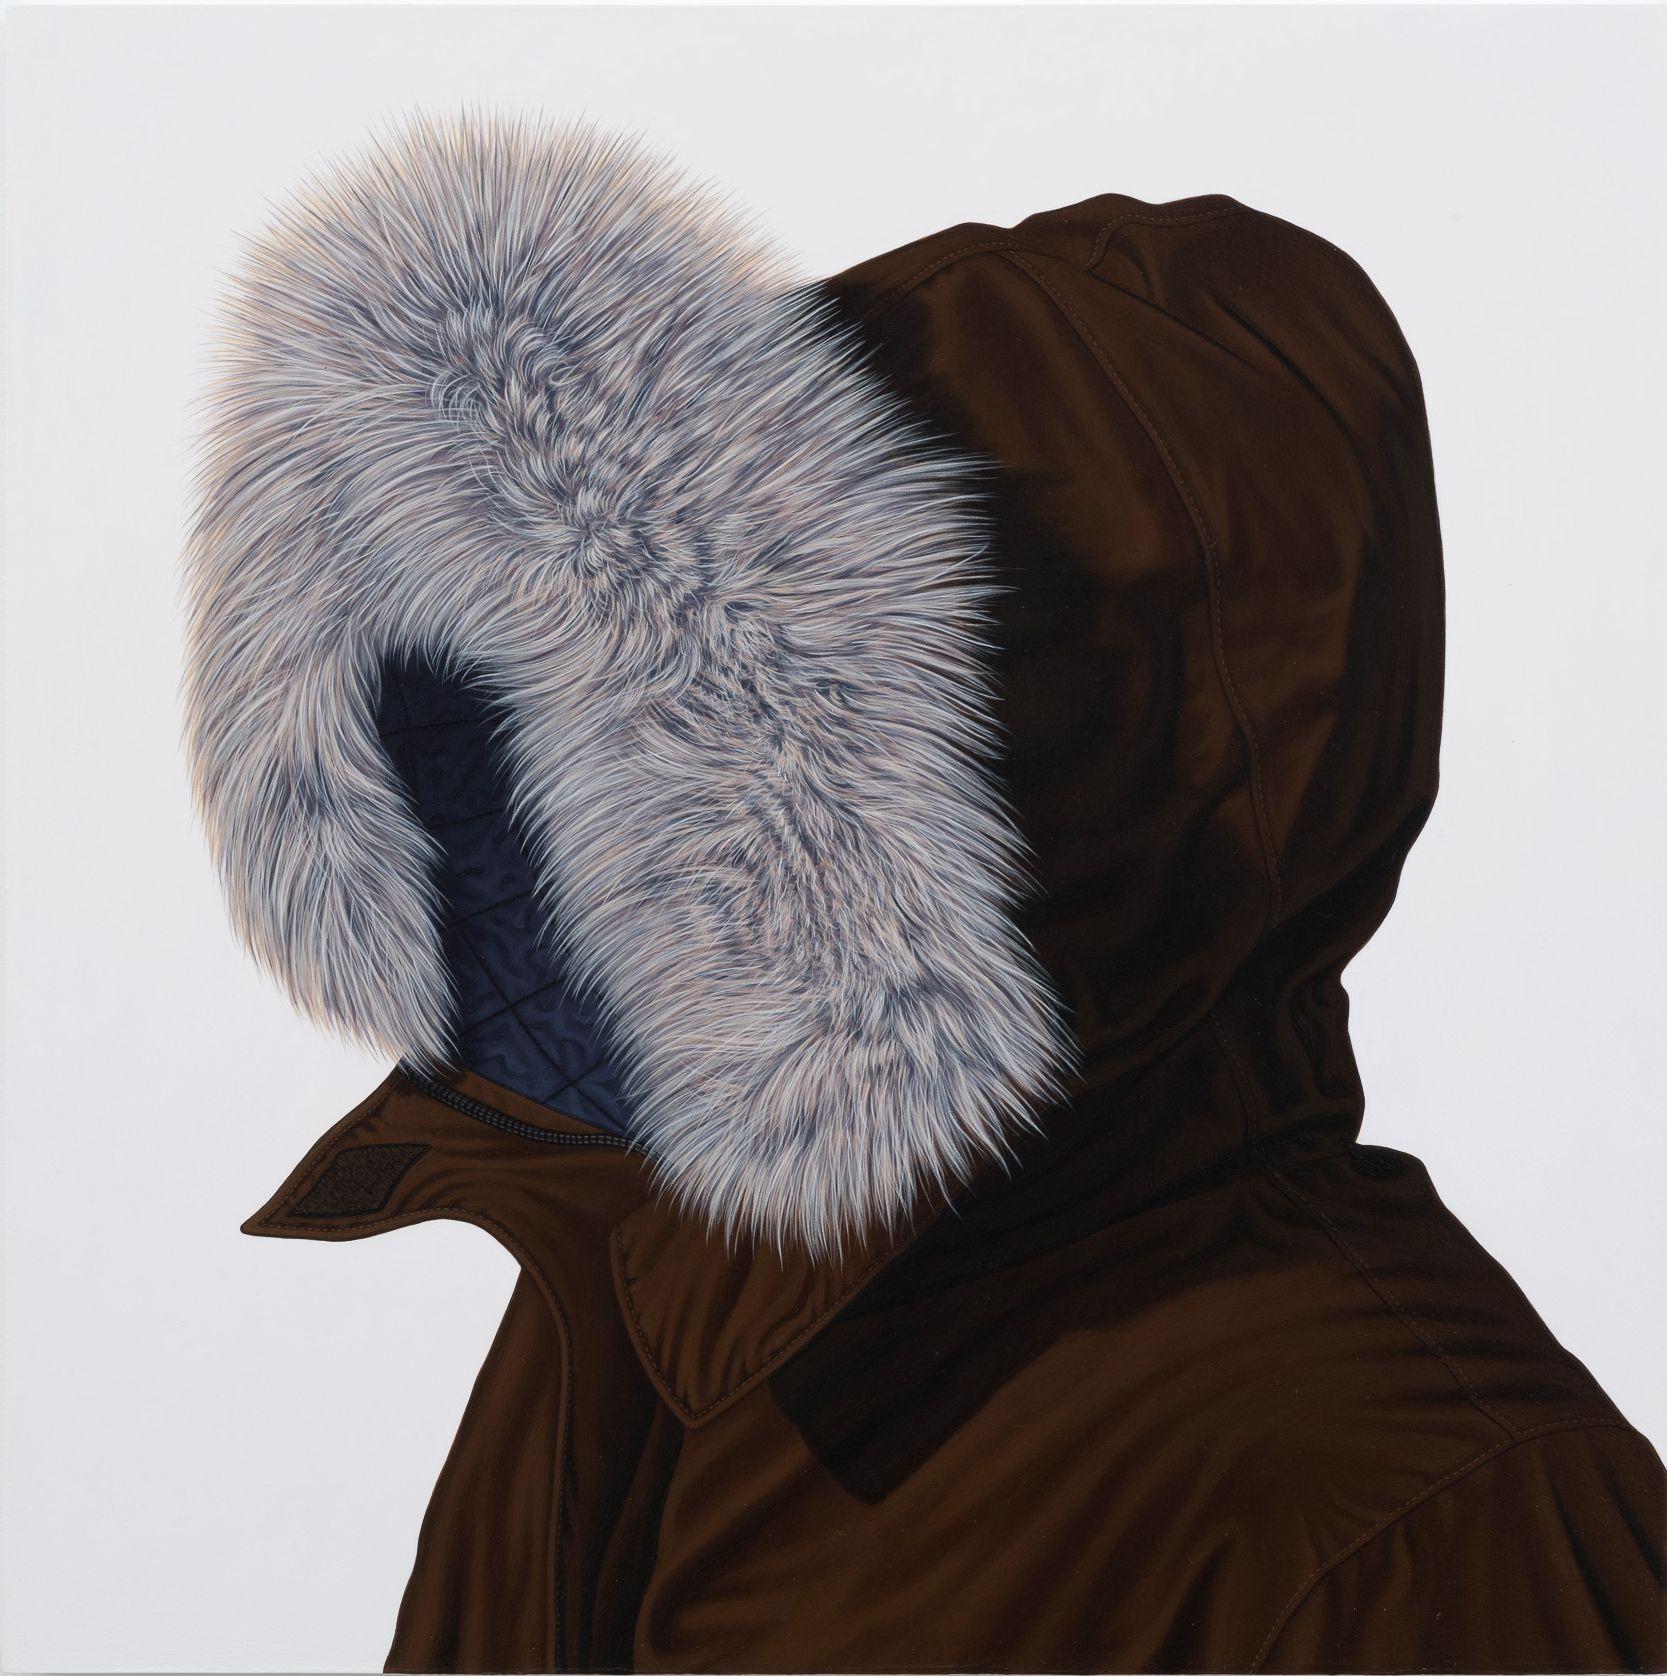 Karel Funk, Untitled #51, 2011